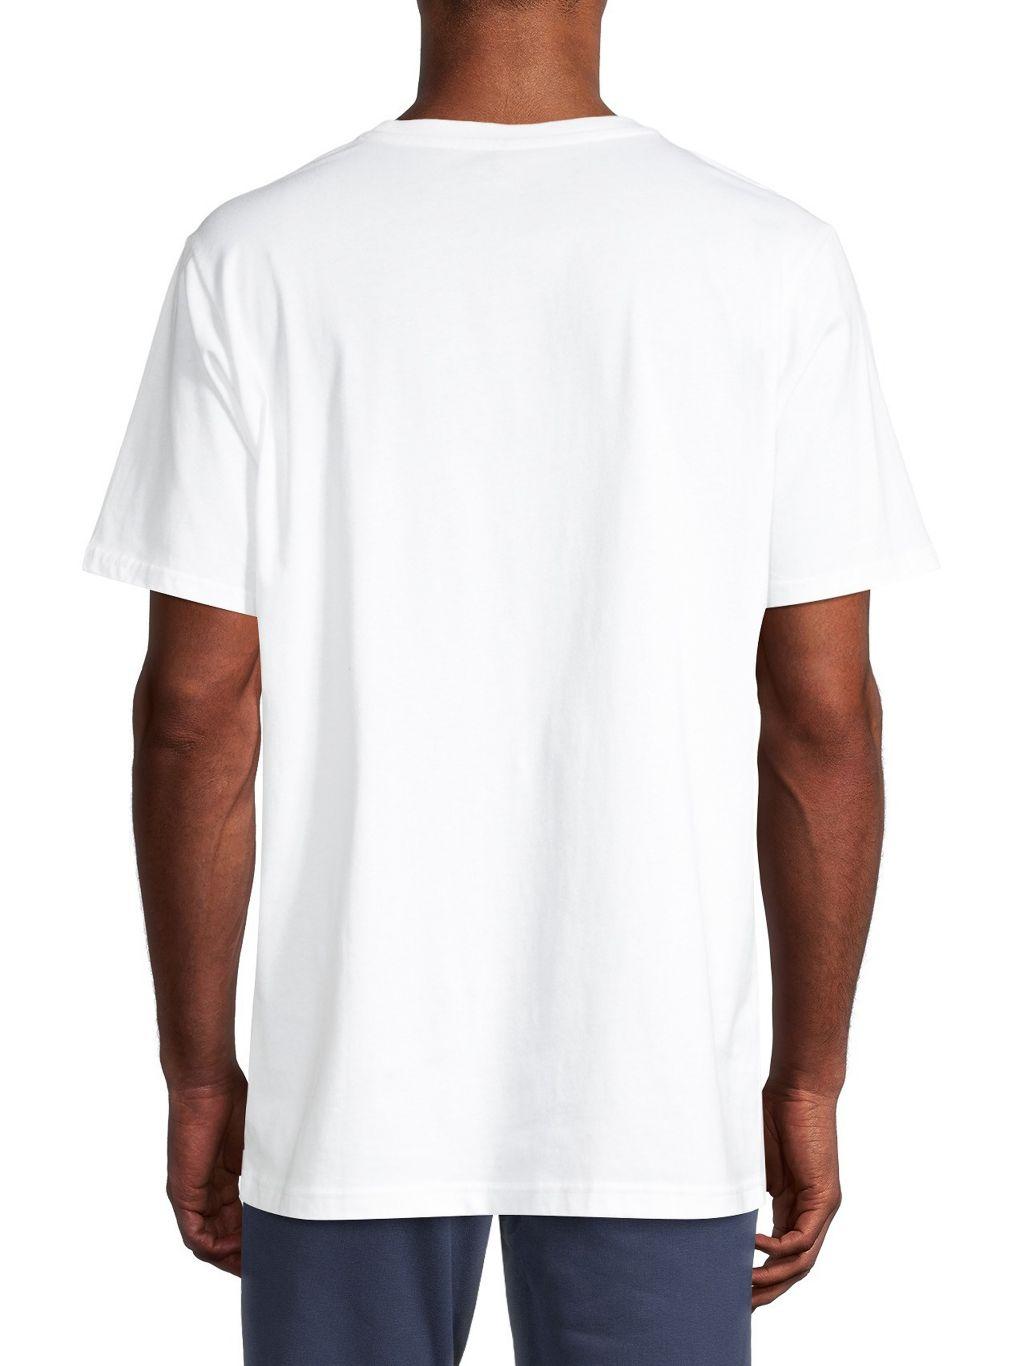 New Balance Logo Cotton Tee